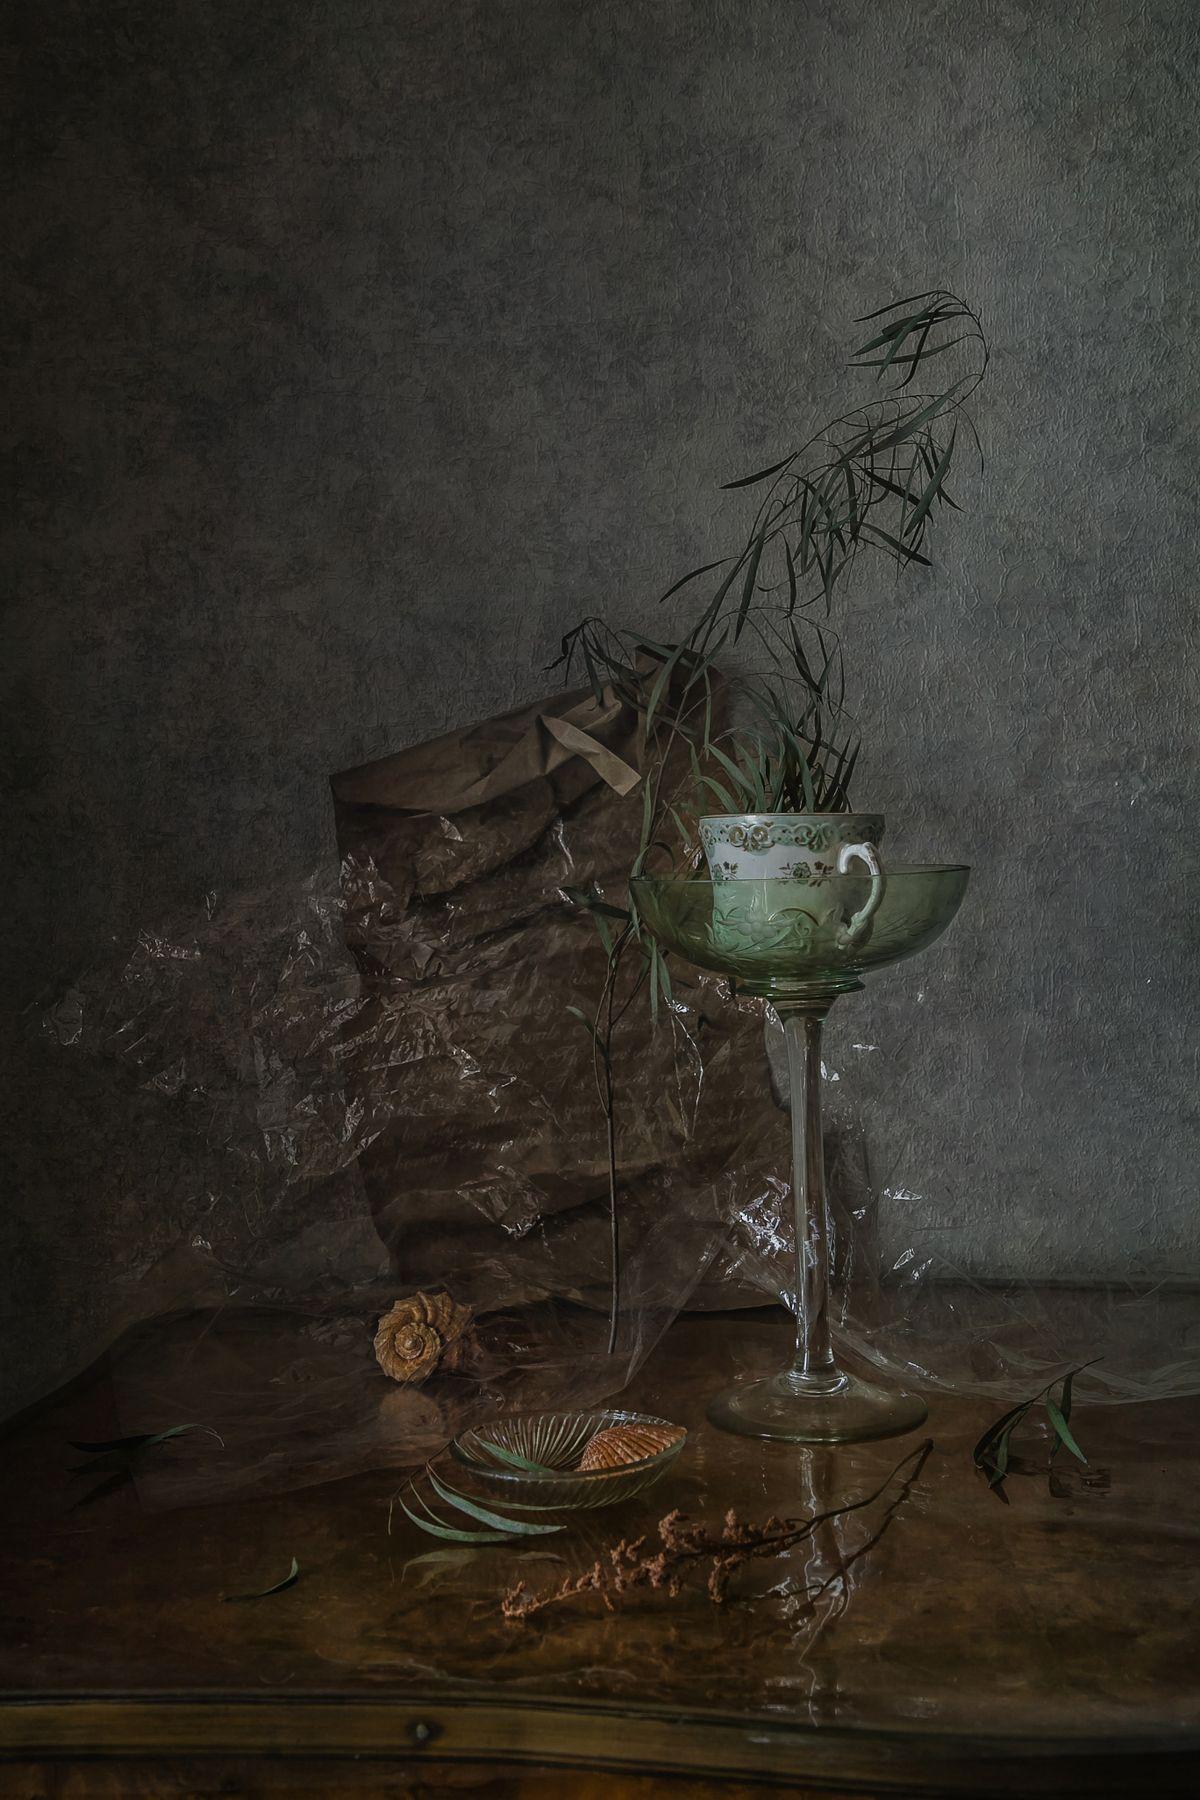 Мятый хрусталь натюрморт стекло фарфор ракушки